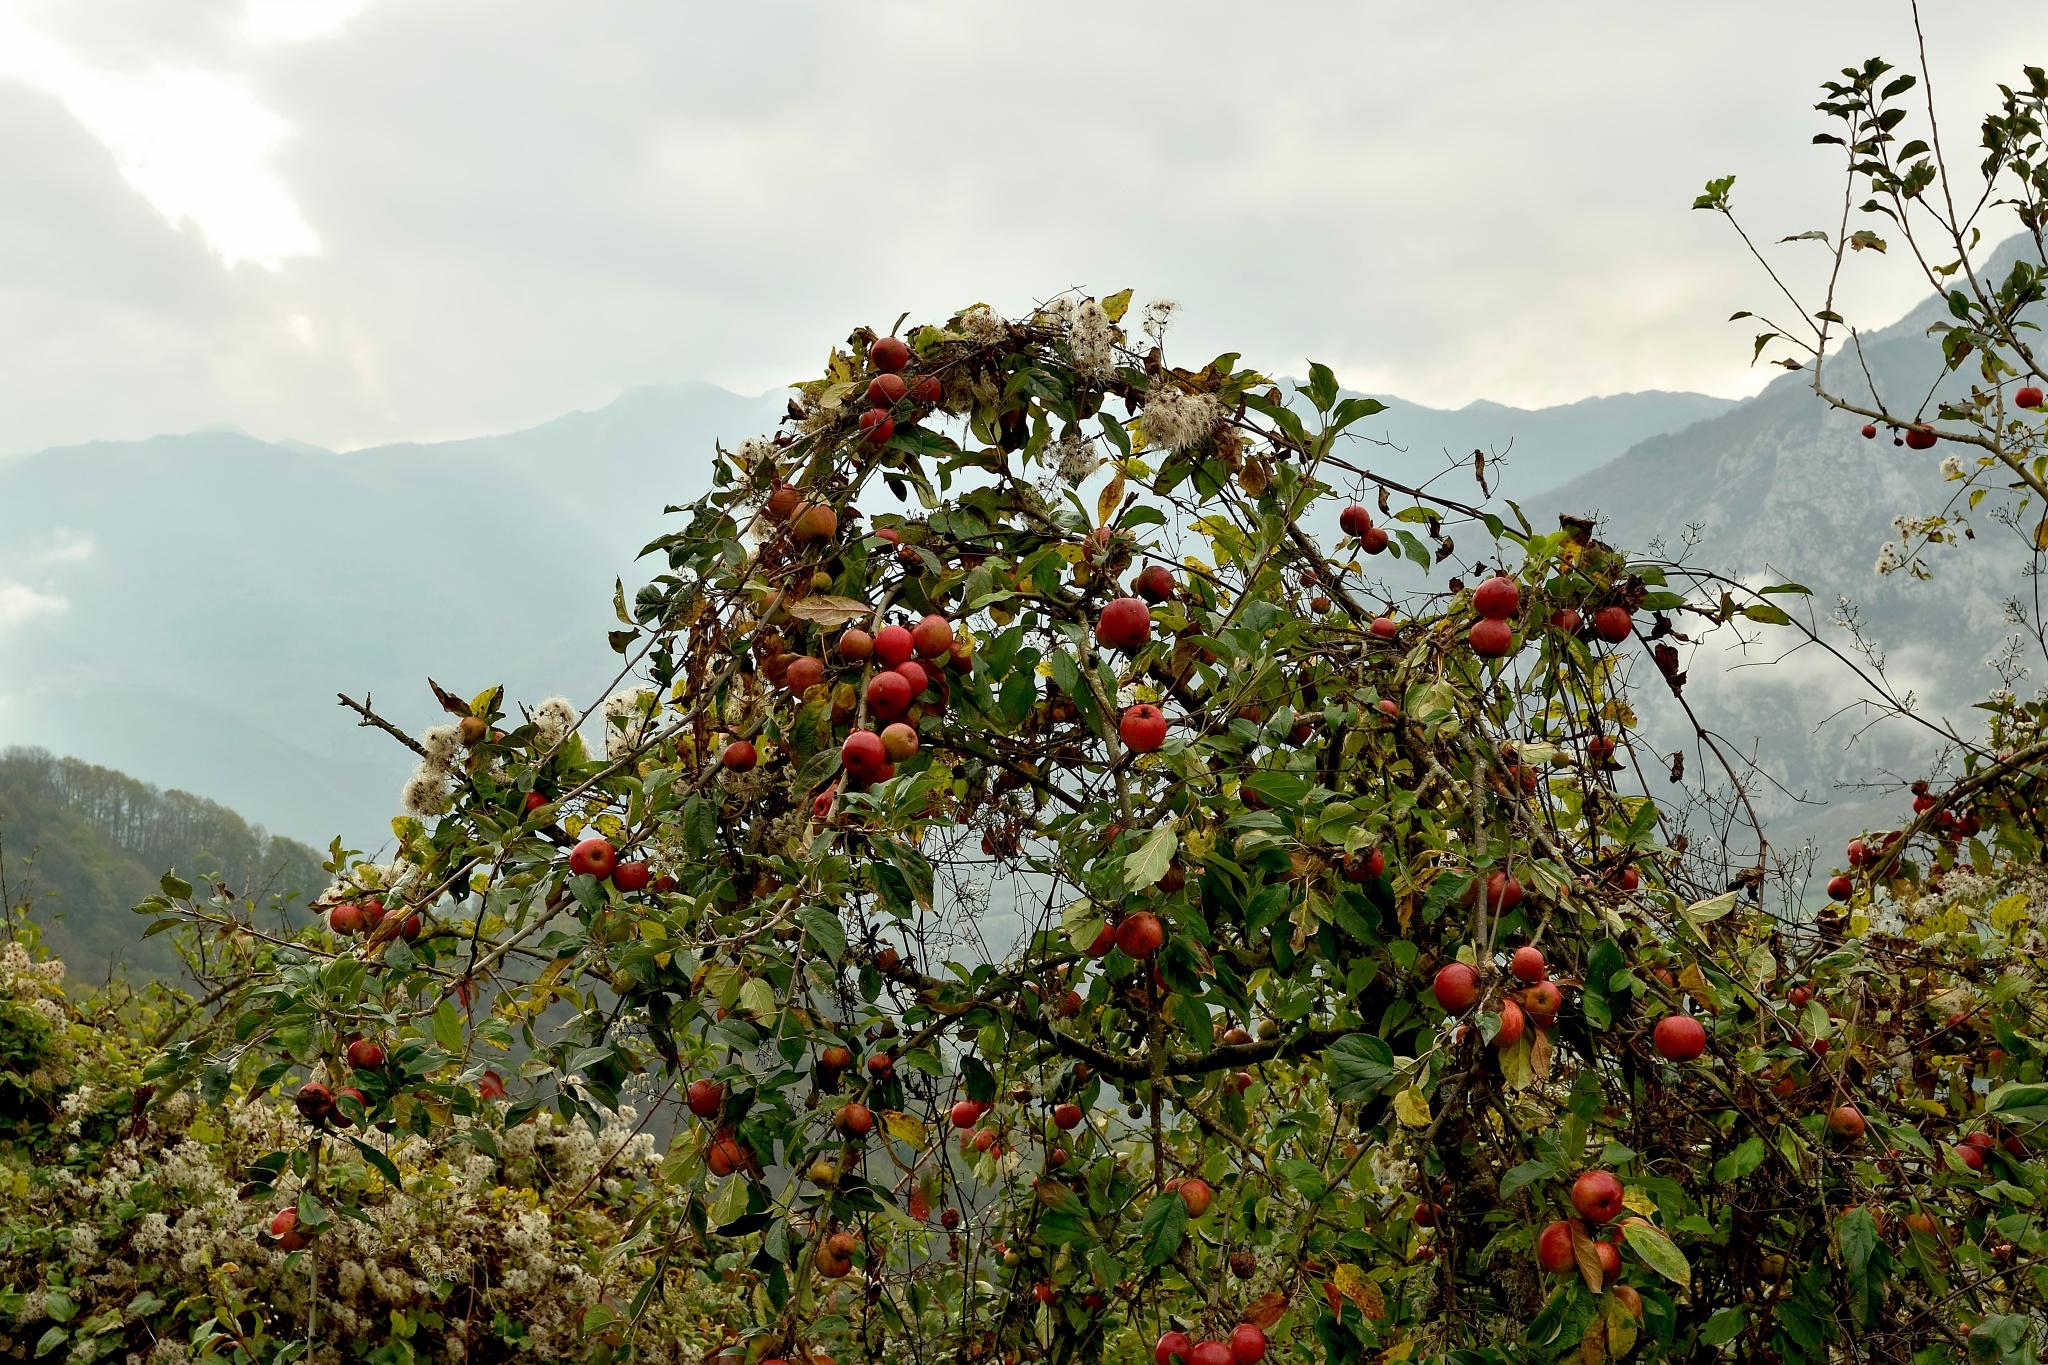 Apples by Xurde González Uría